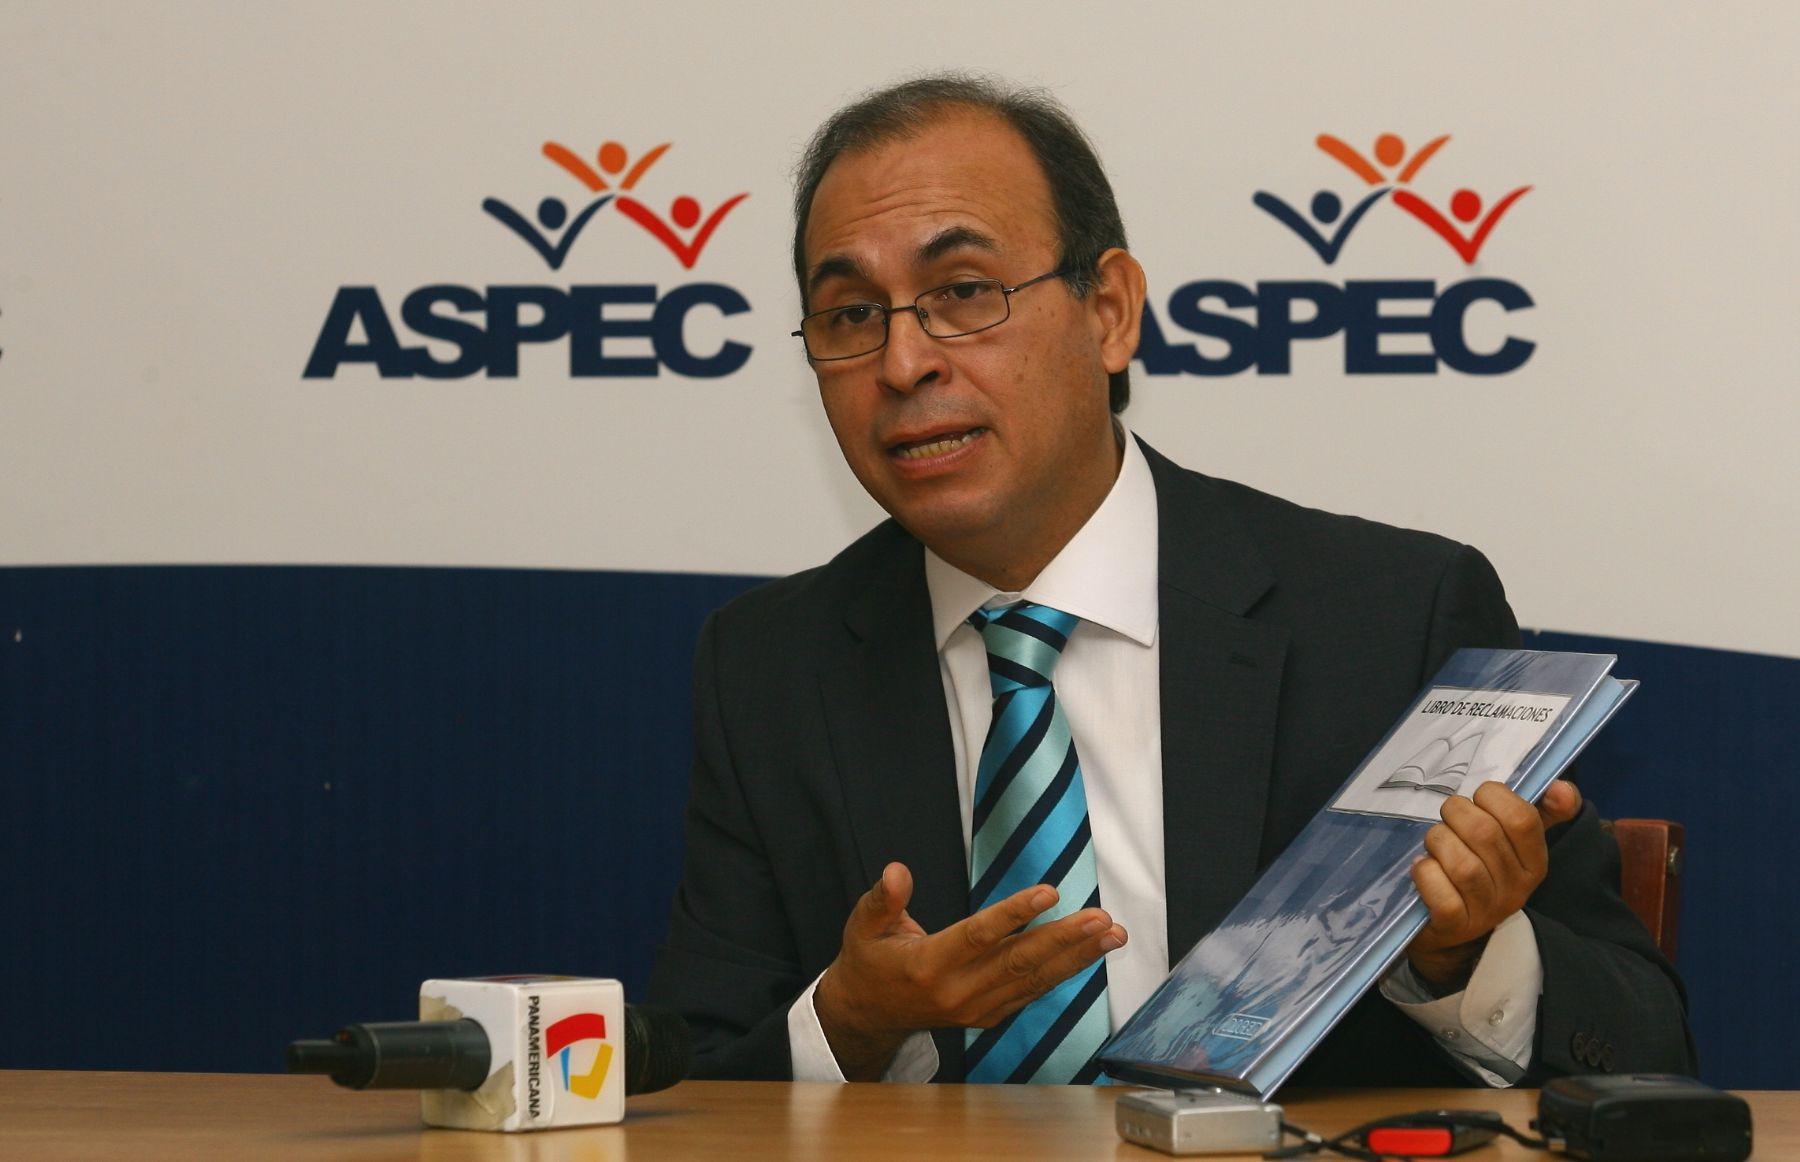 Presidente de Aspec, Crisólogo Cáceres. ANDINA/archivo